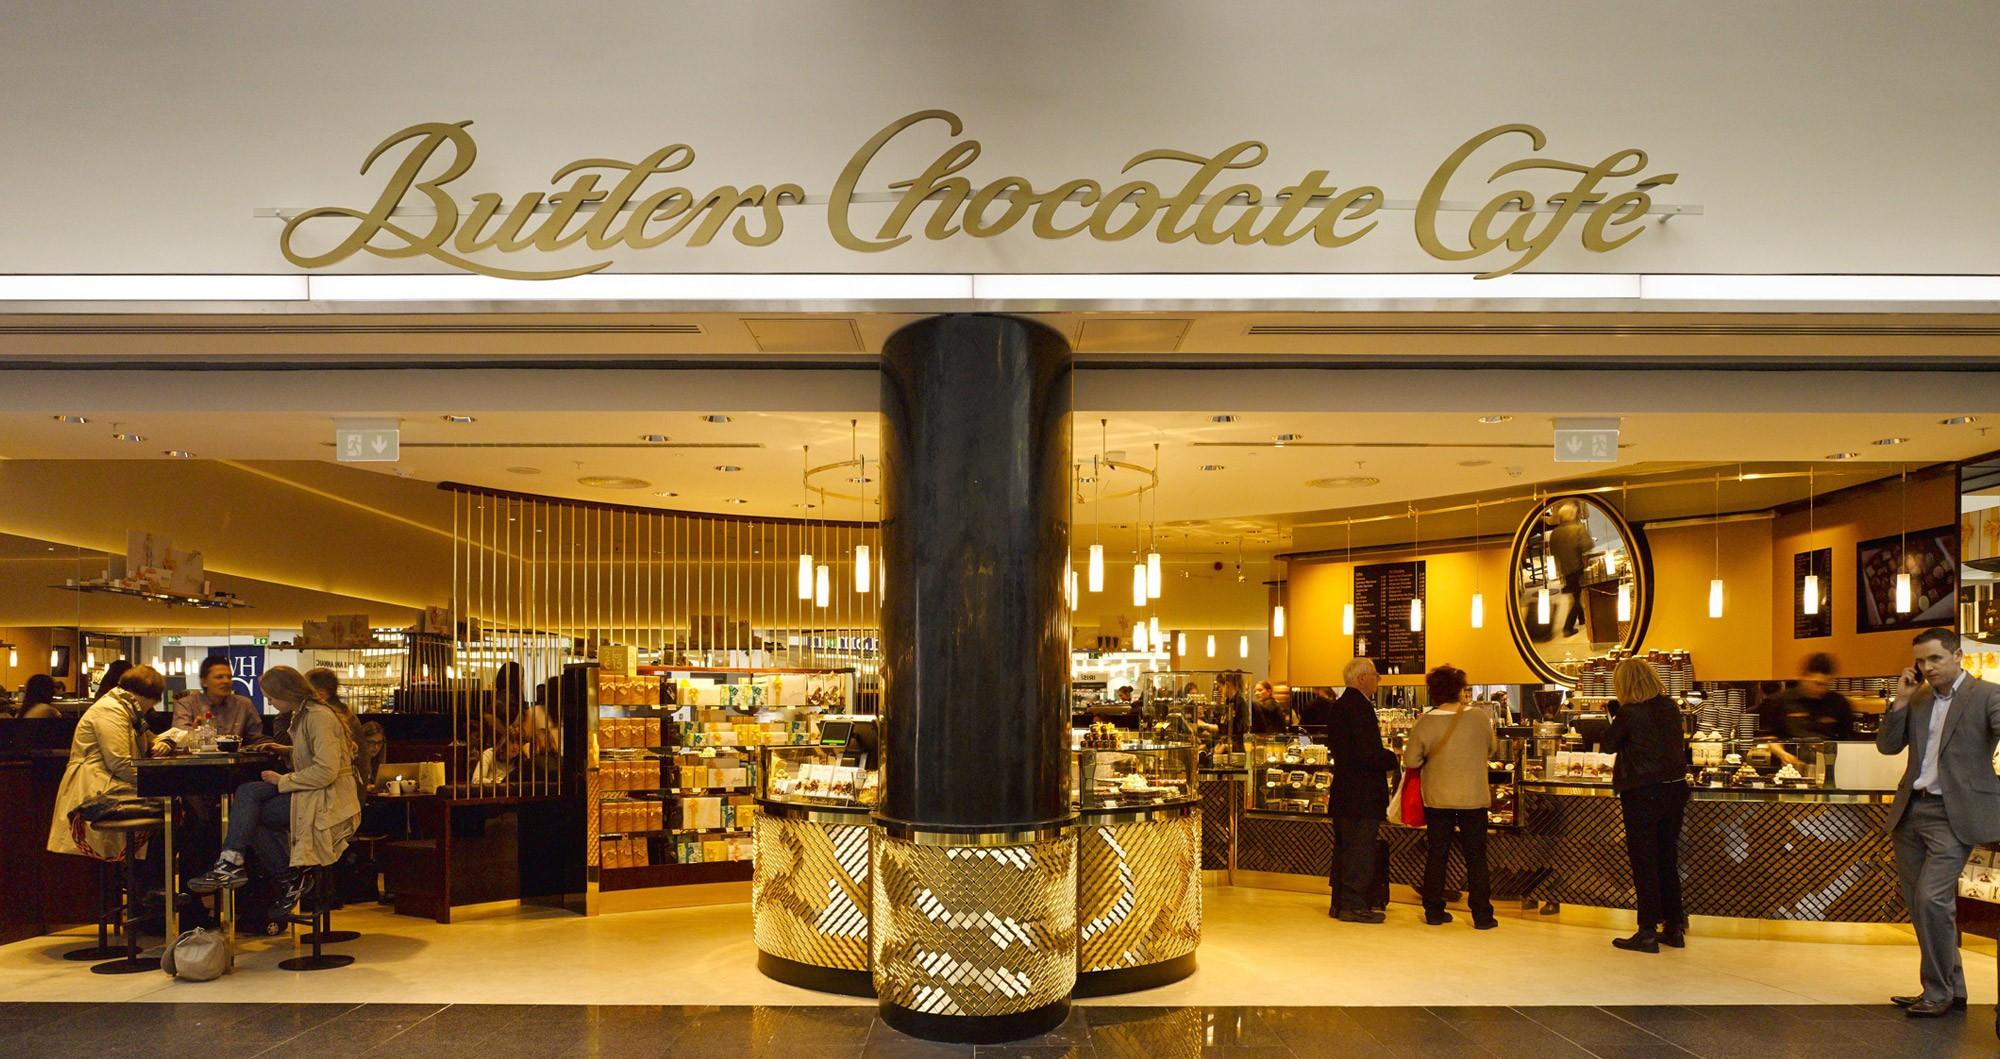 Butlers Chocolate Café, T1 Dublin Airport